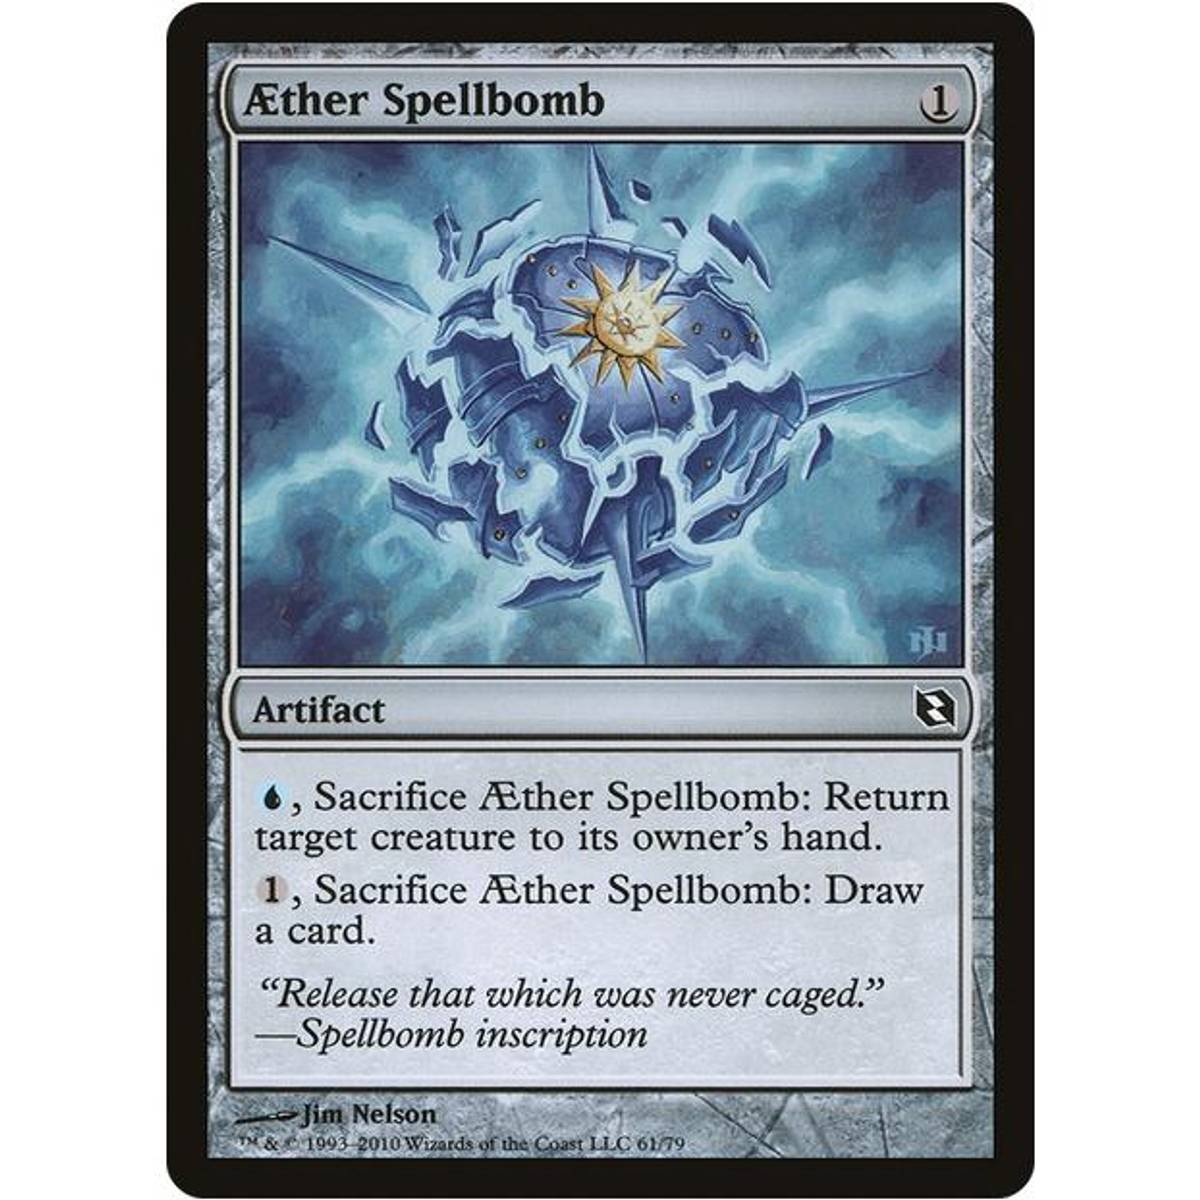 Aether Spellbomb